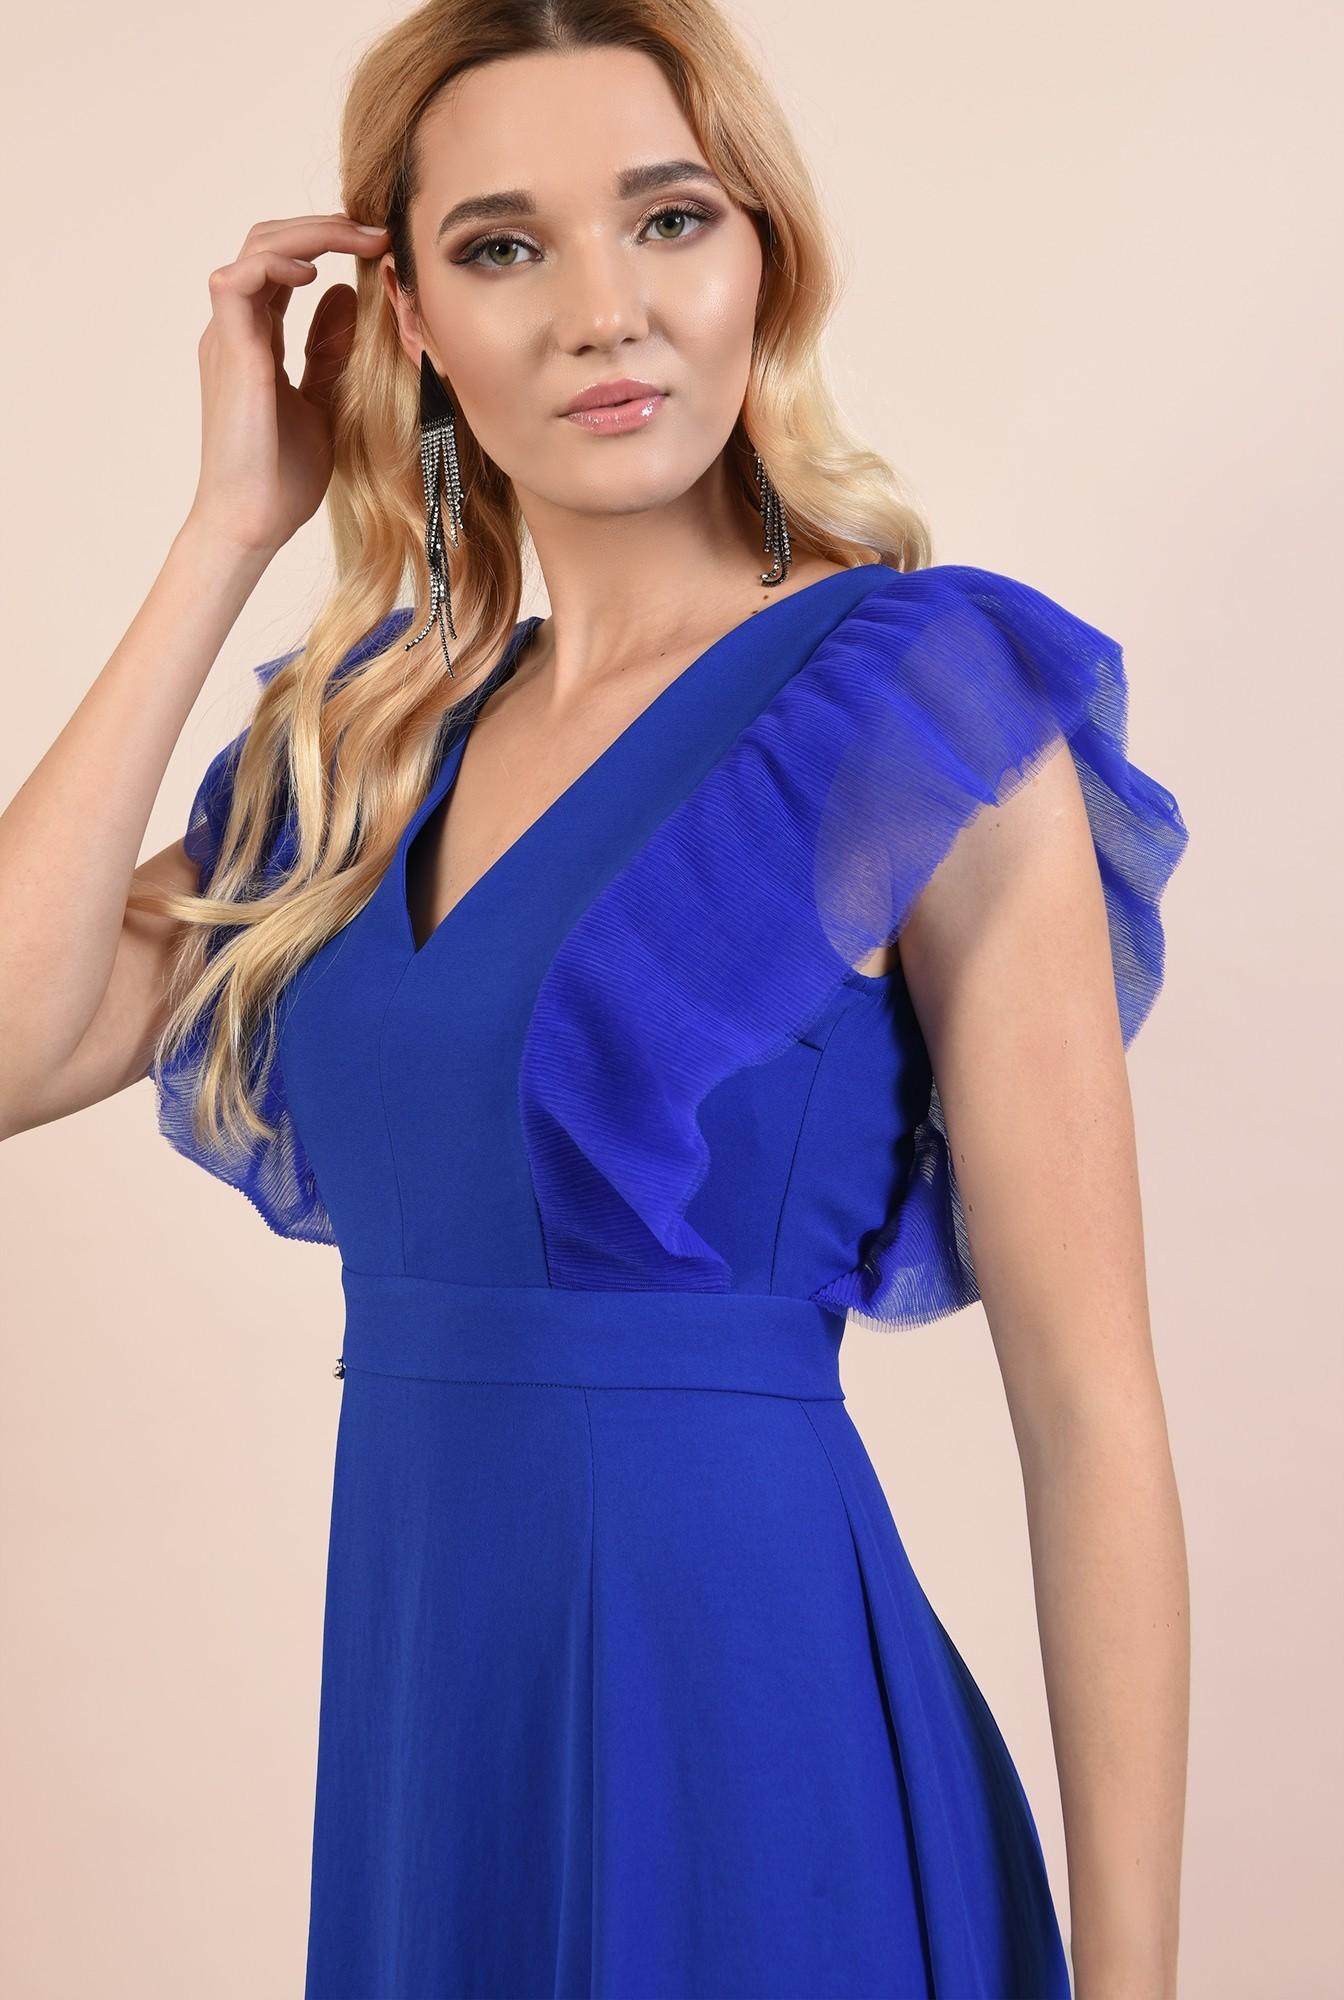 2 - rochie eleganta, lunga, cu anchior, slit, funda la spate